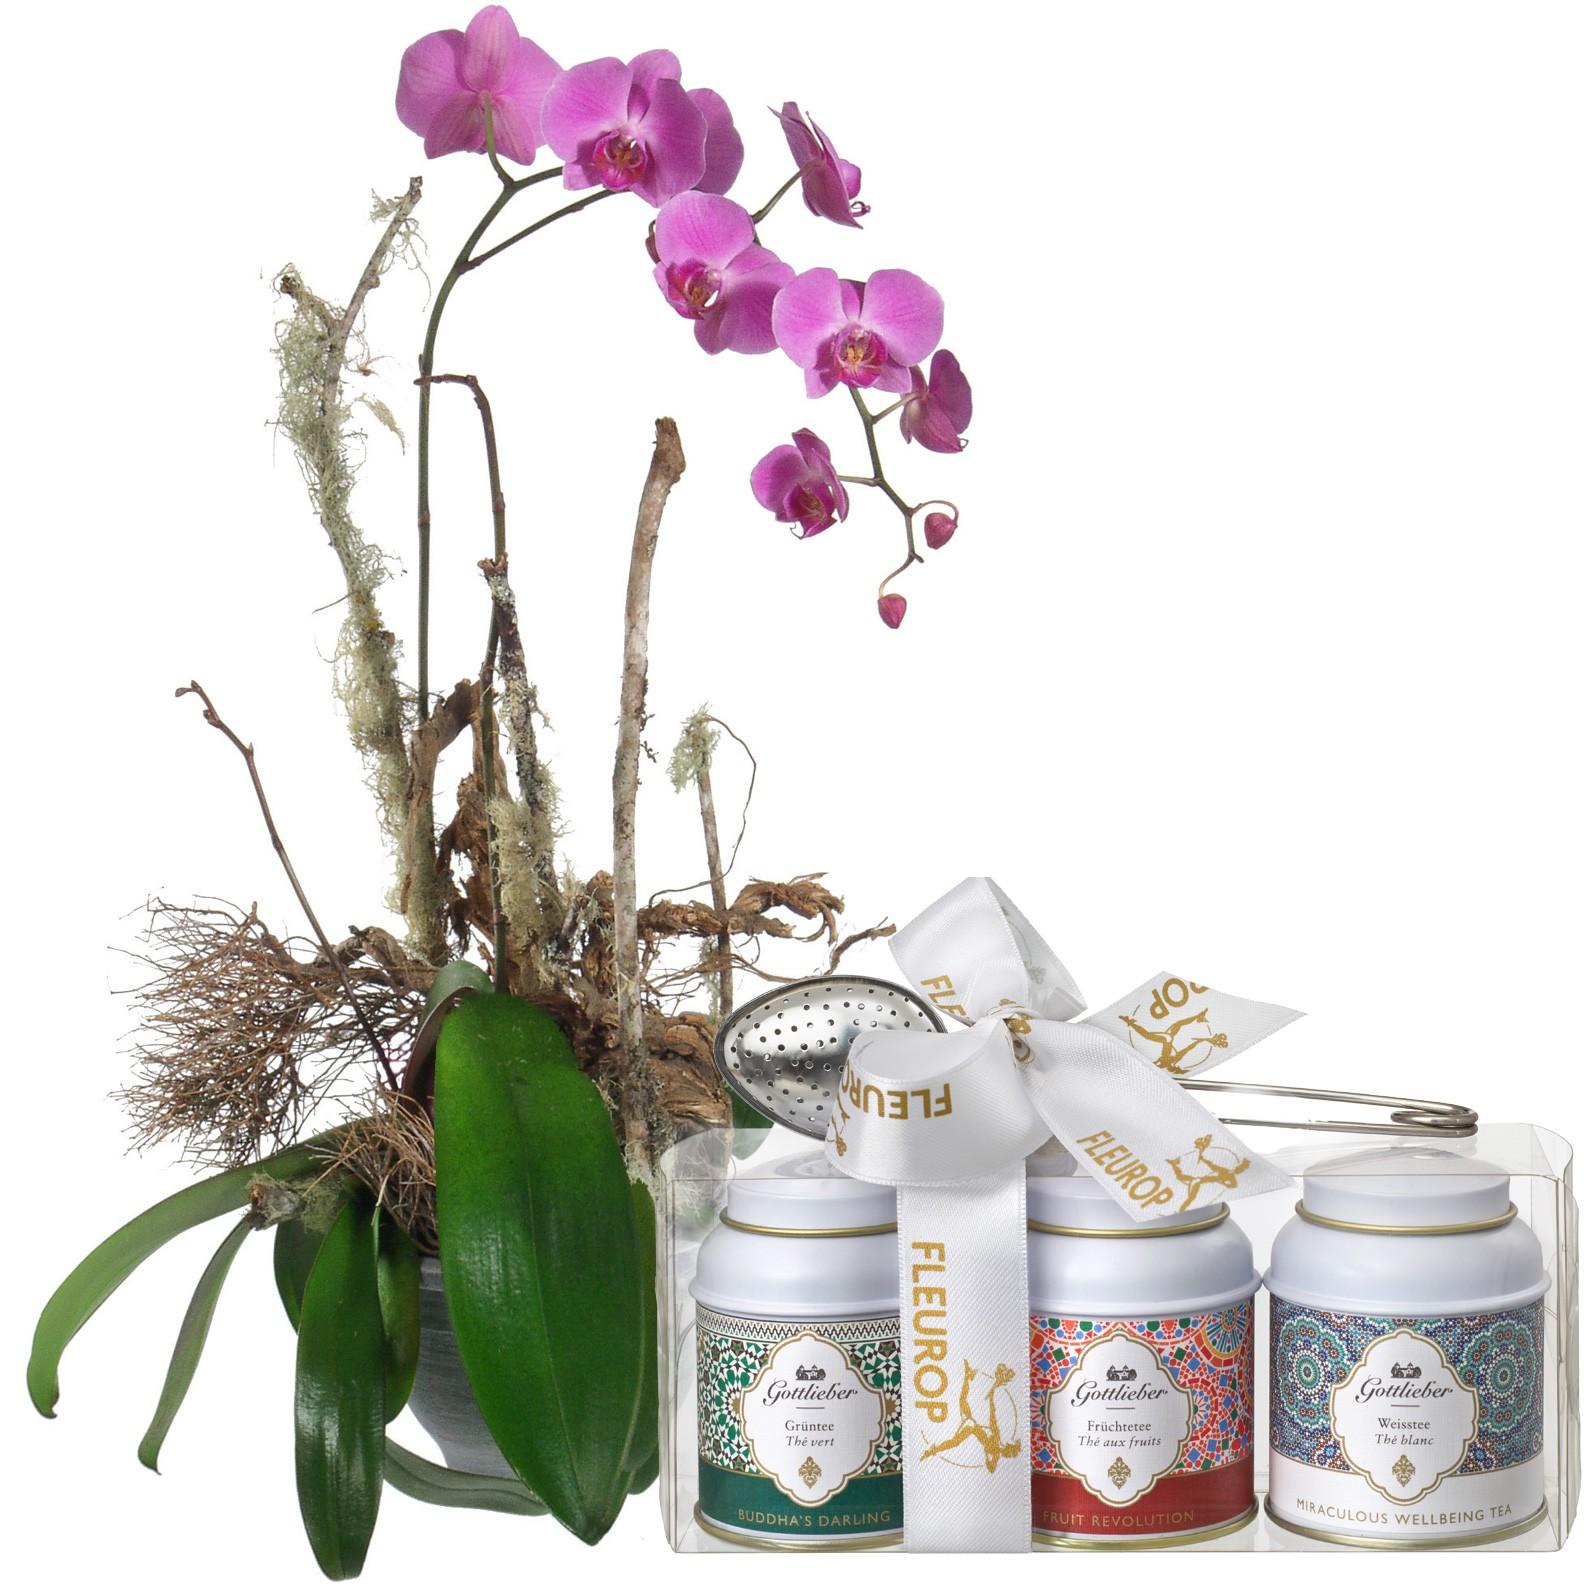 Edle Orchidee Pflanze Mit Gottlieber Tee Geschenk Set